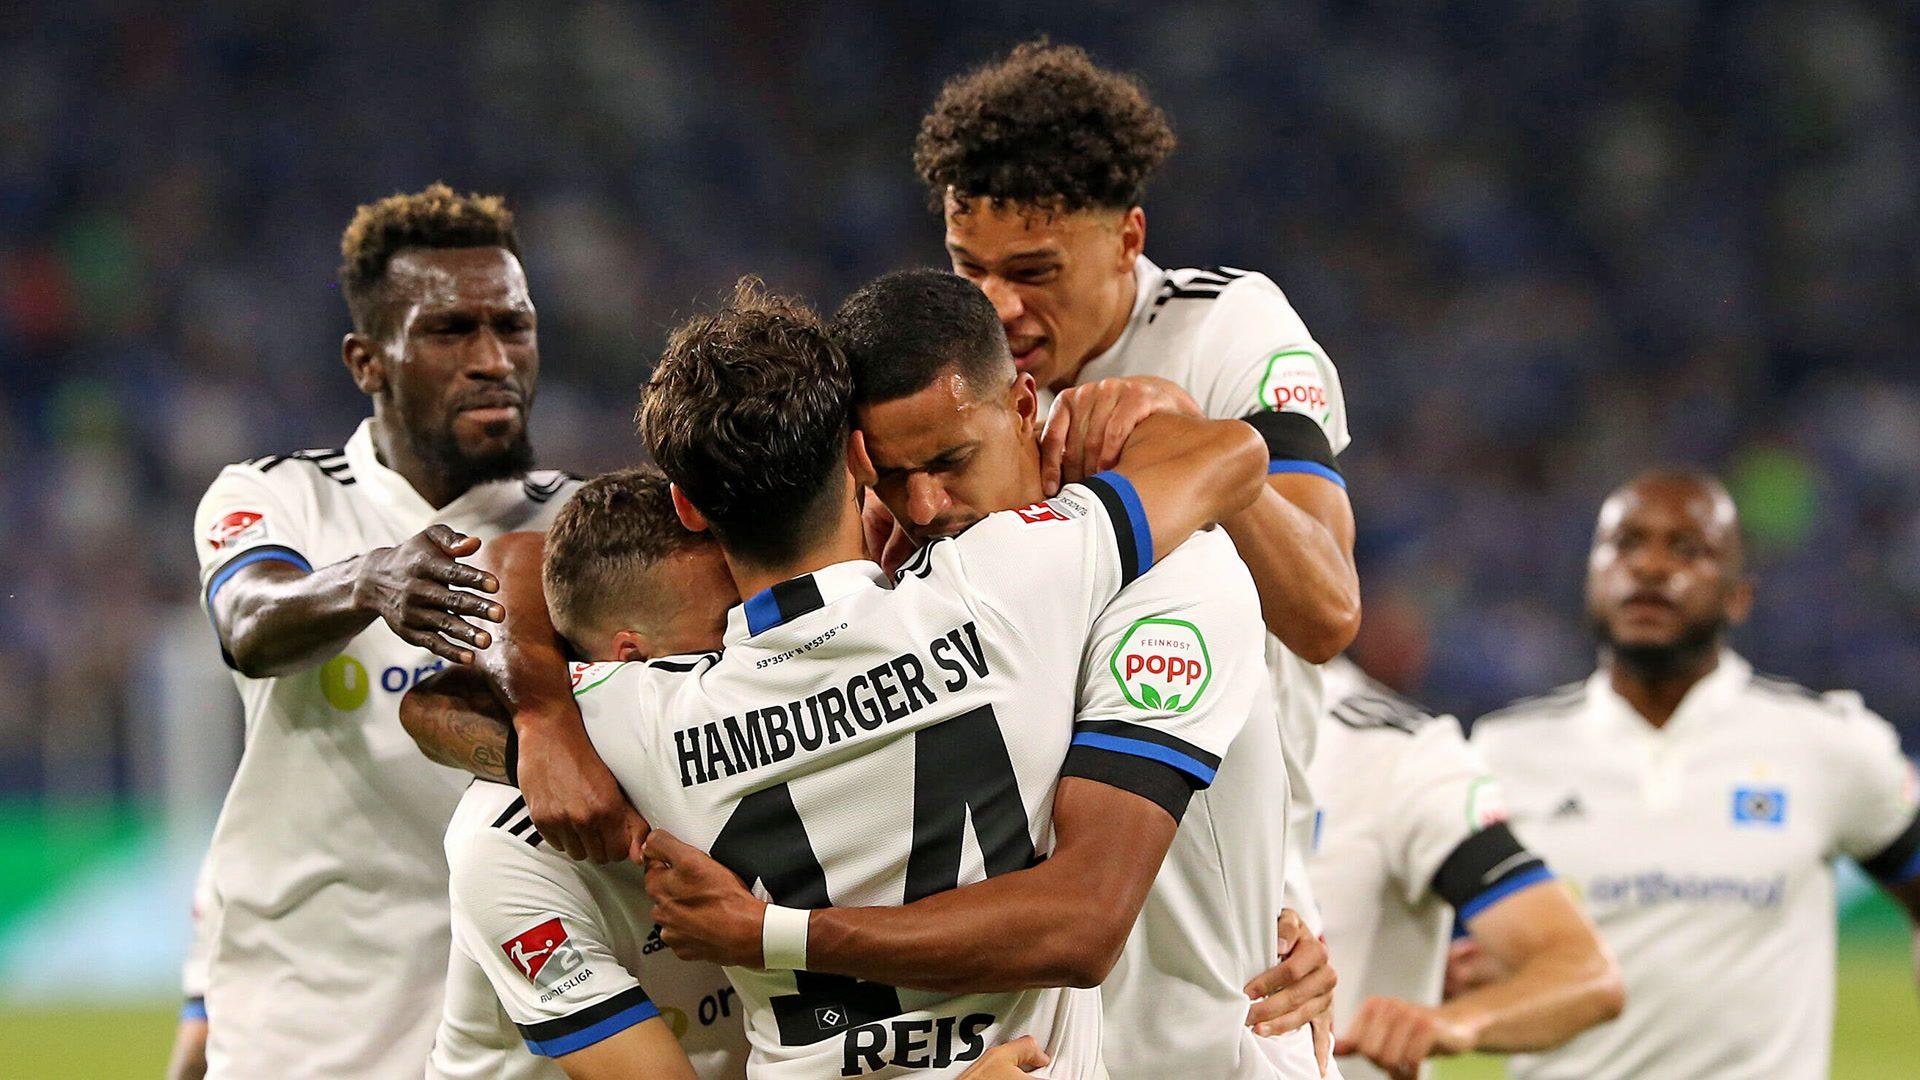 Bundesliga 2 round-up: Hamburg stun Schalke